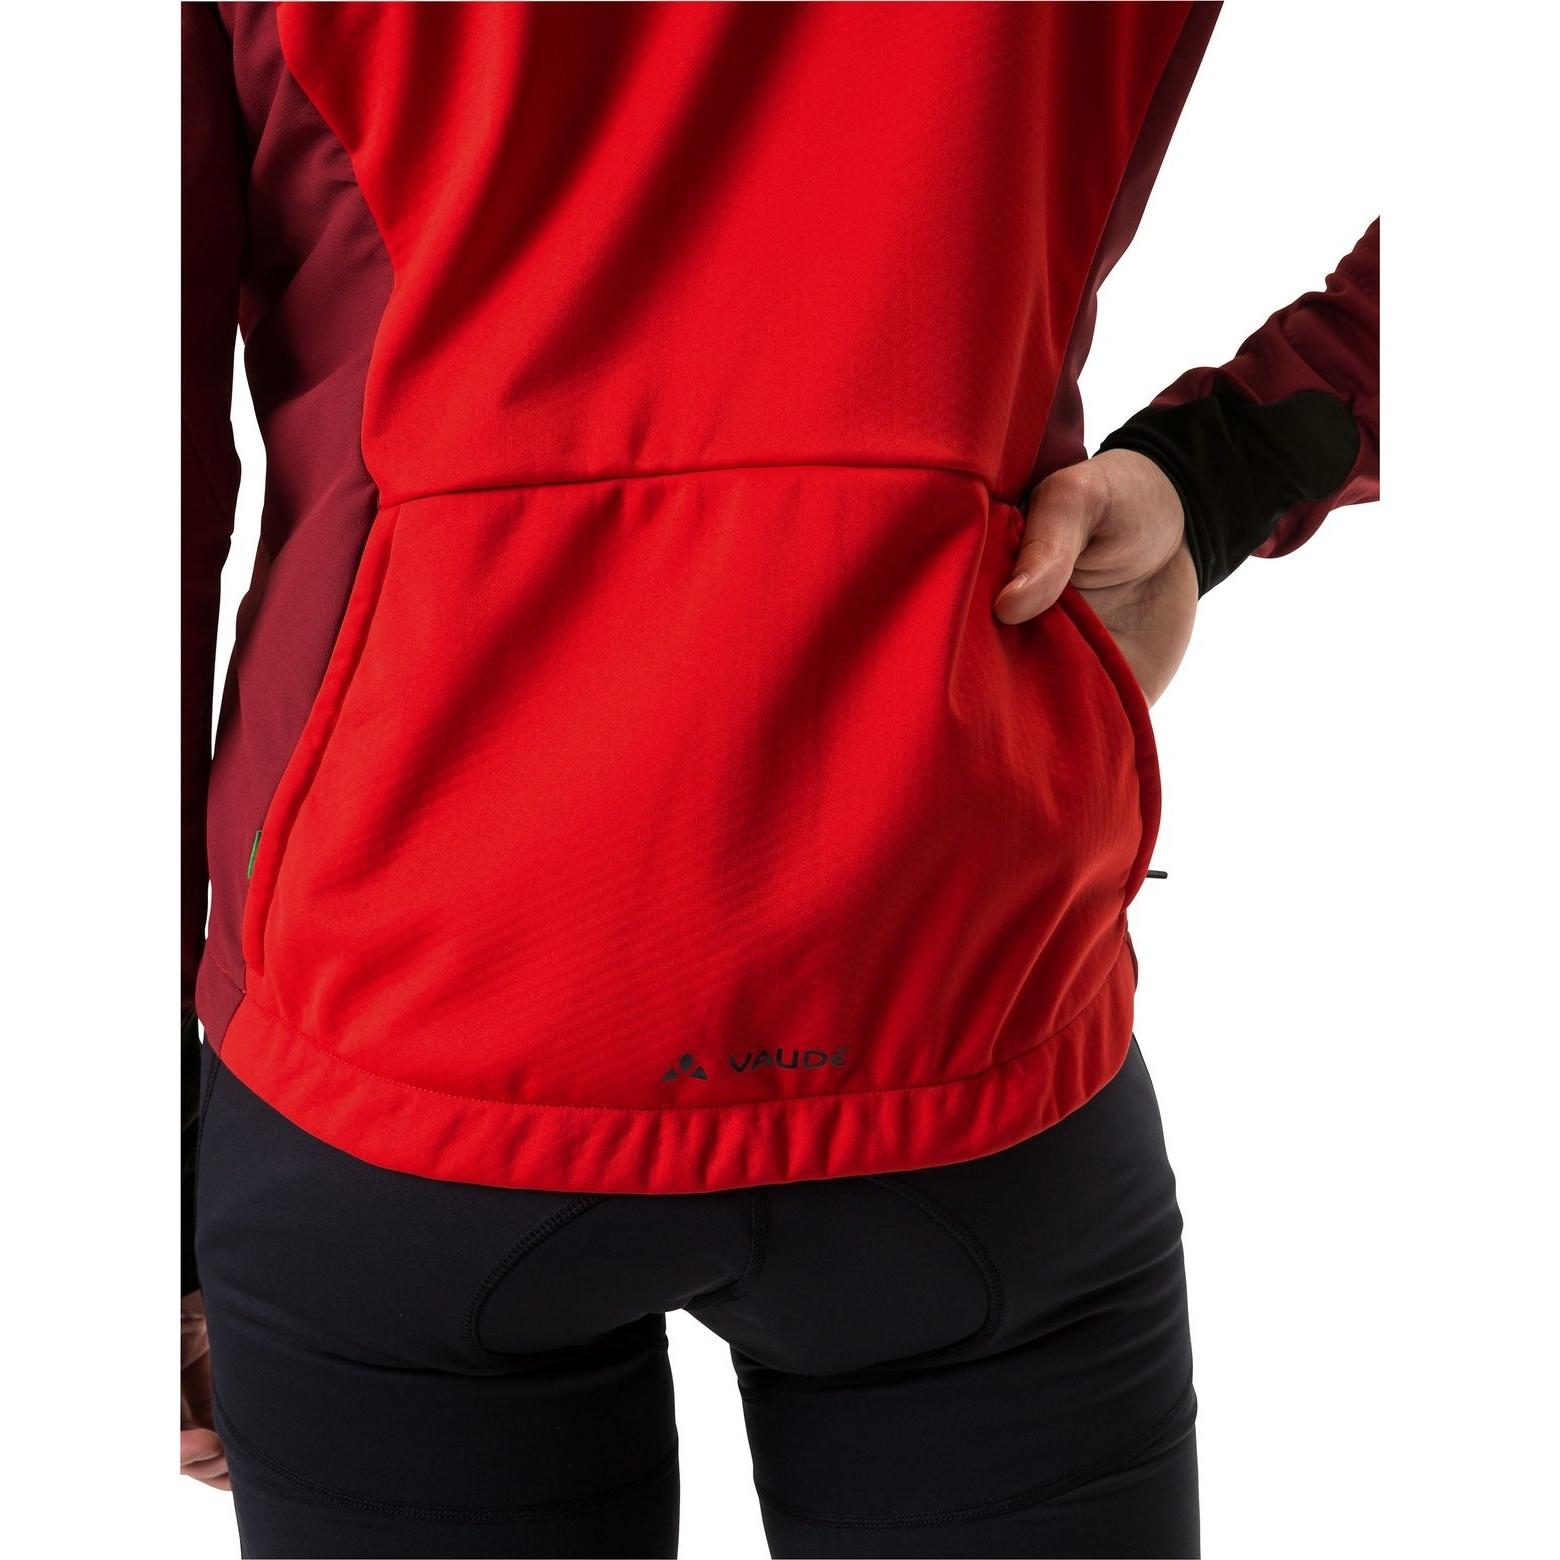 Image of Vaude Men's Kuro Softshell Jacket - mars red